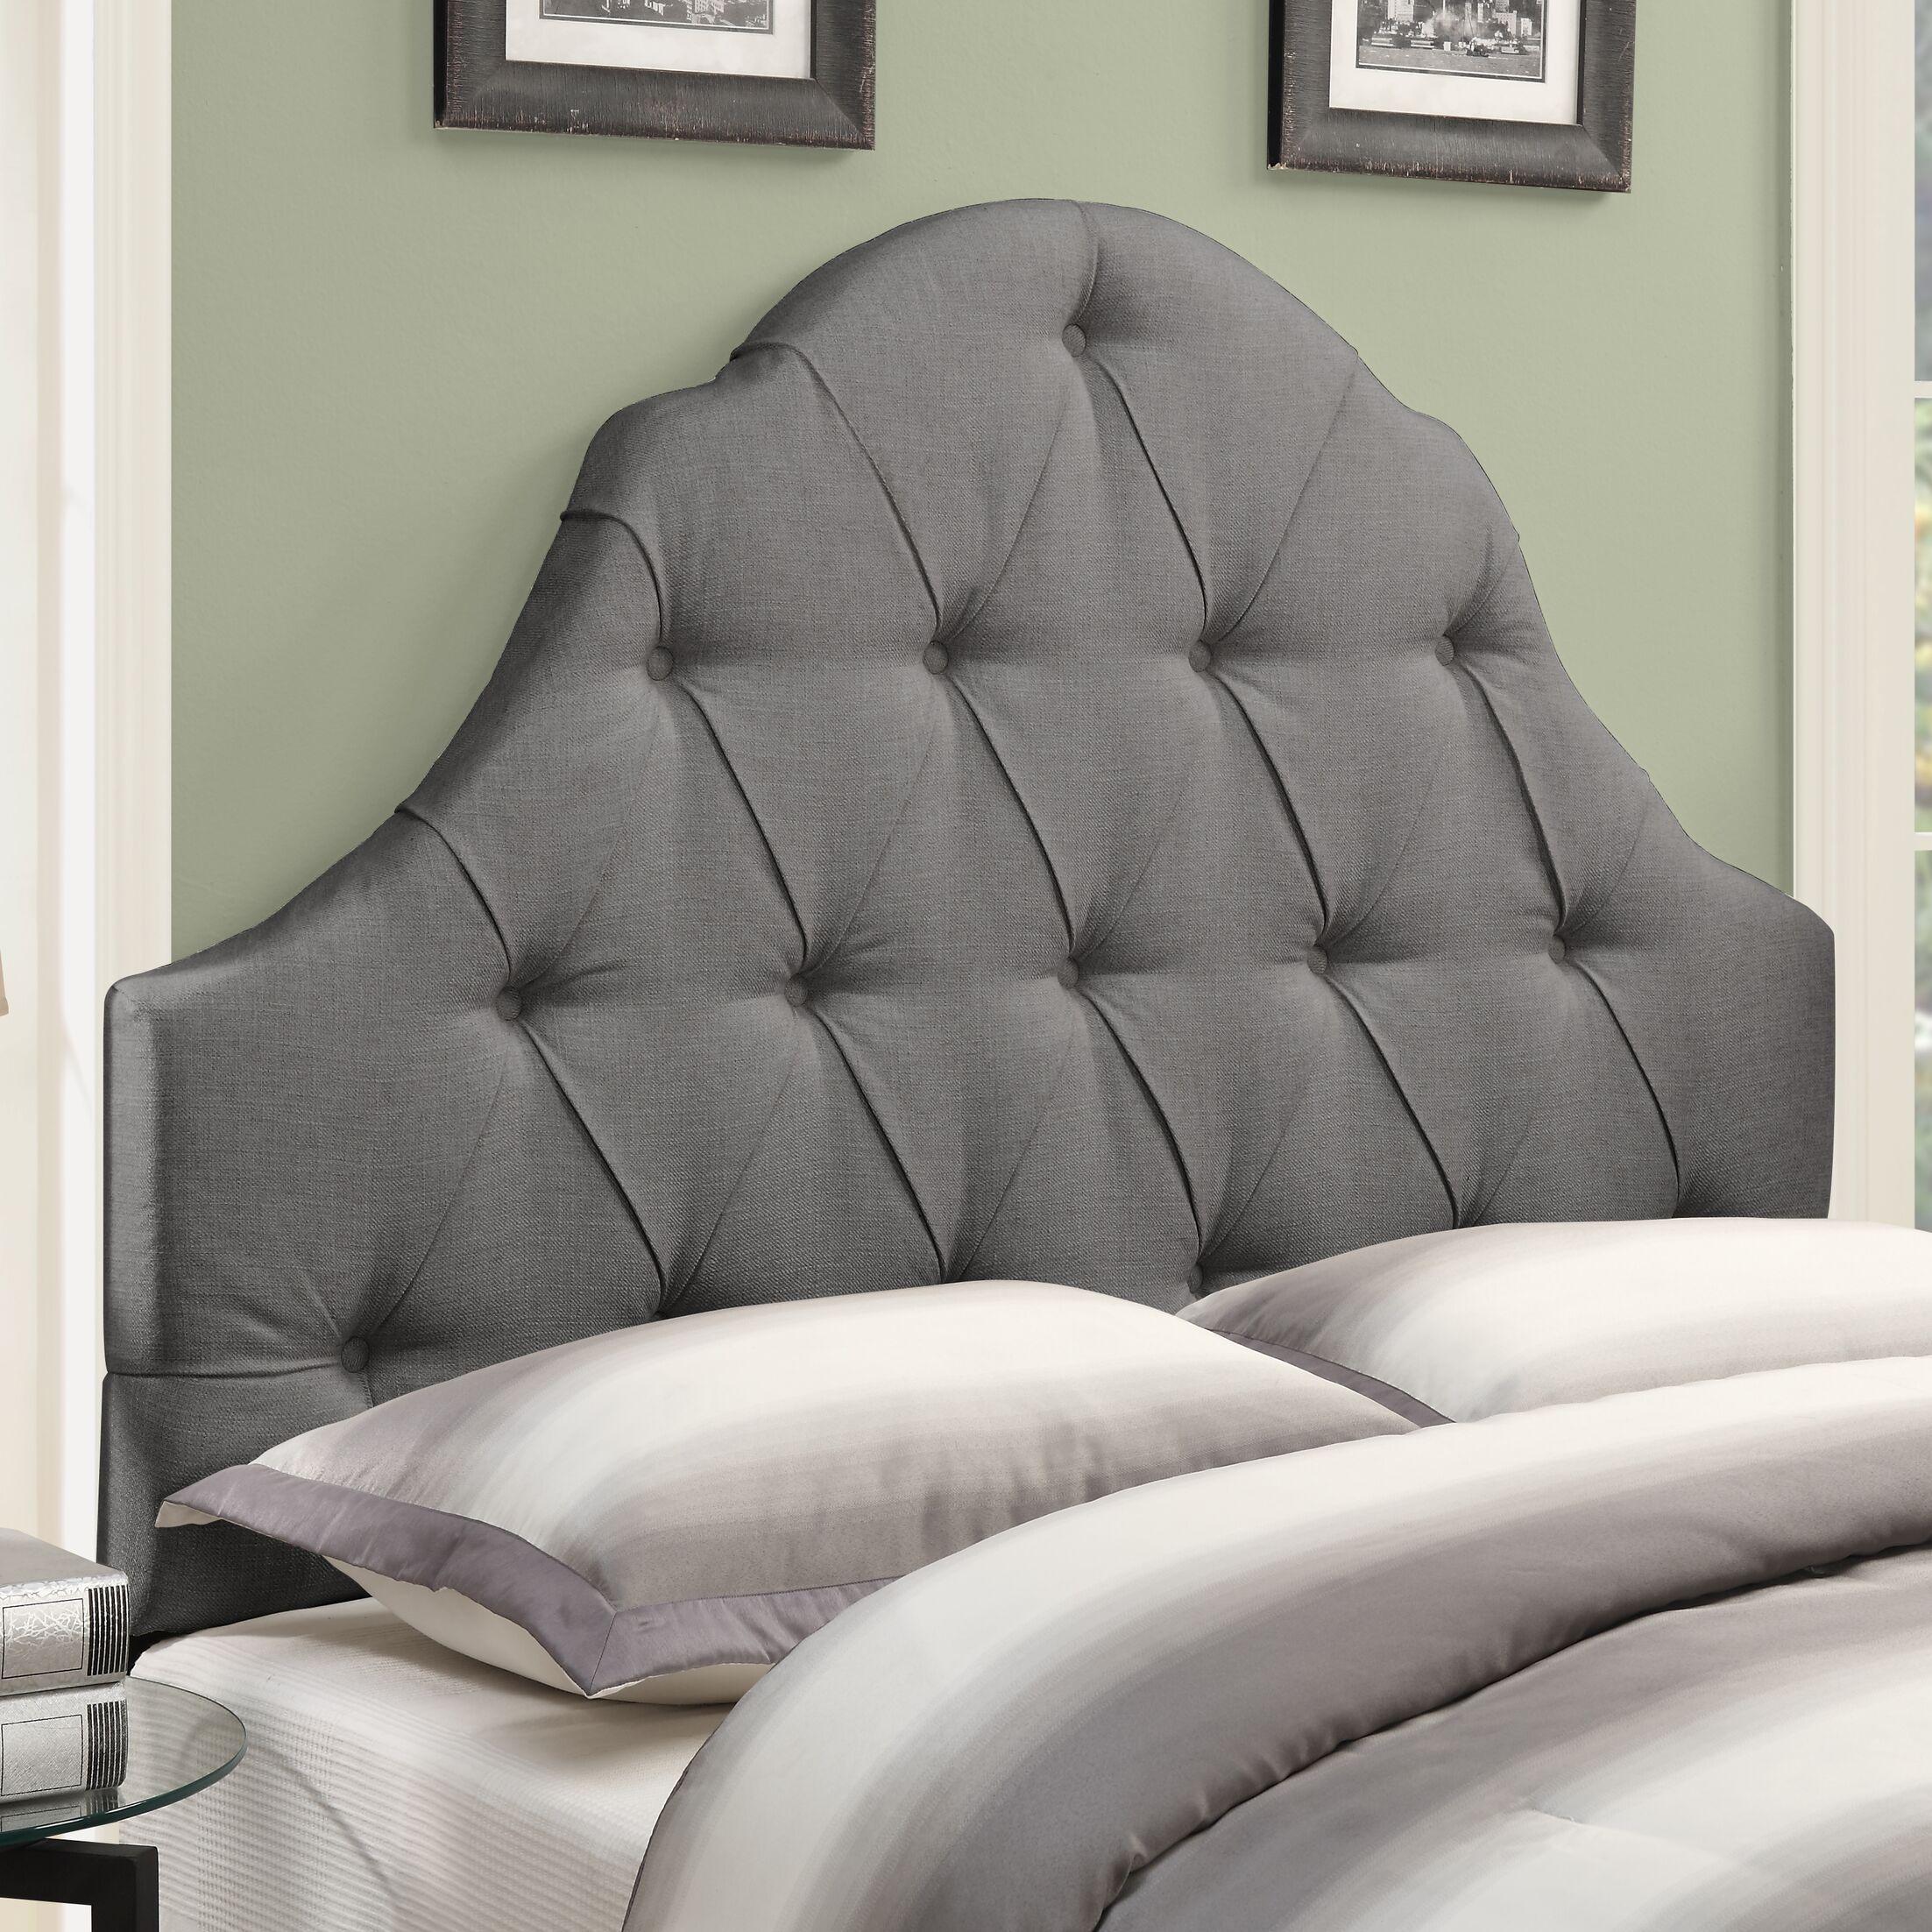 Redfield Upholstered Panel Headboard Size: King, Upholstery: Ash